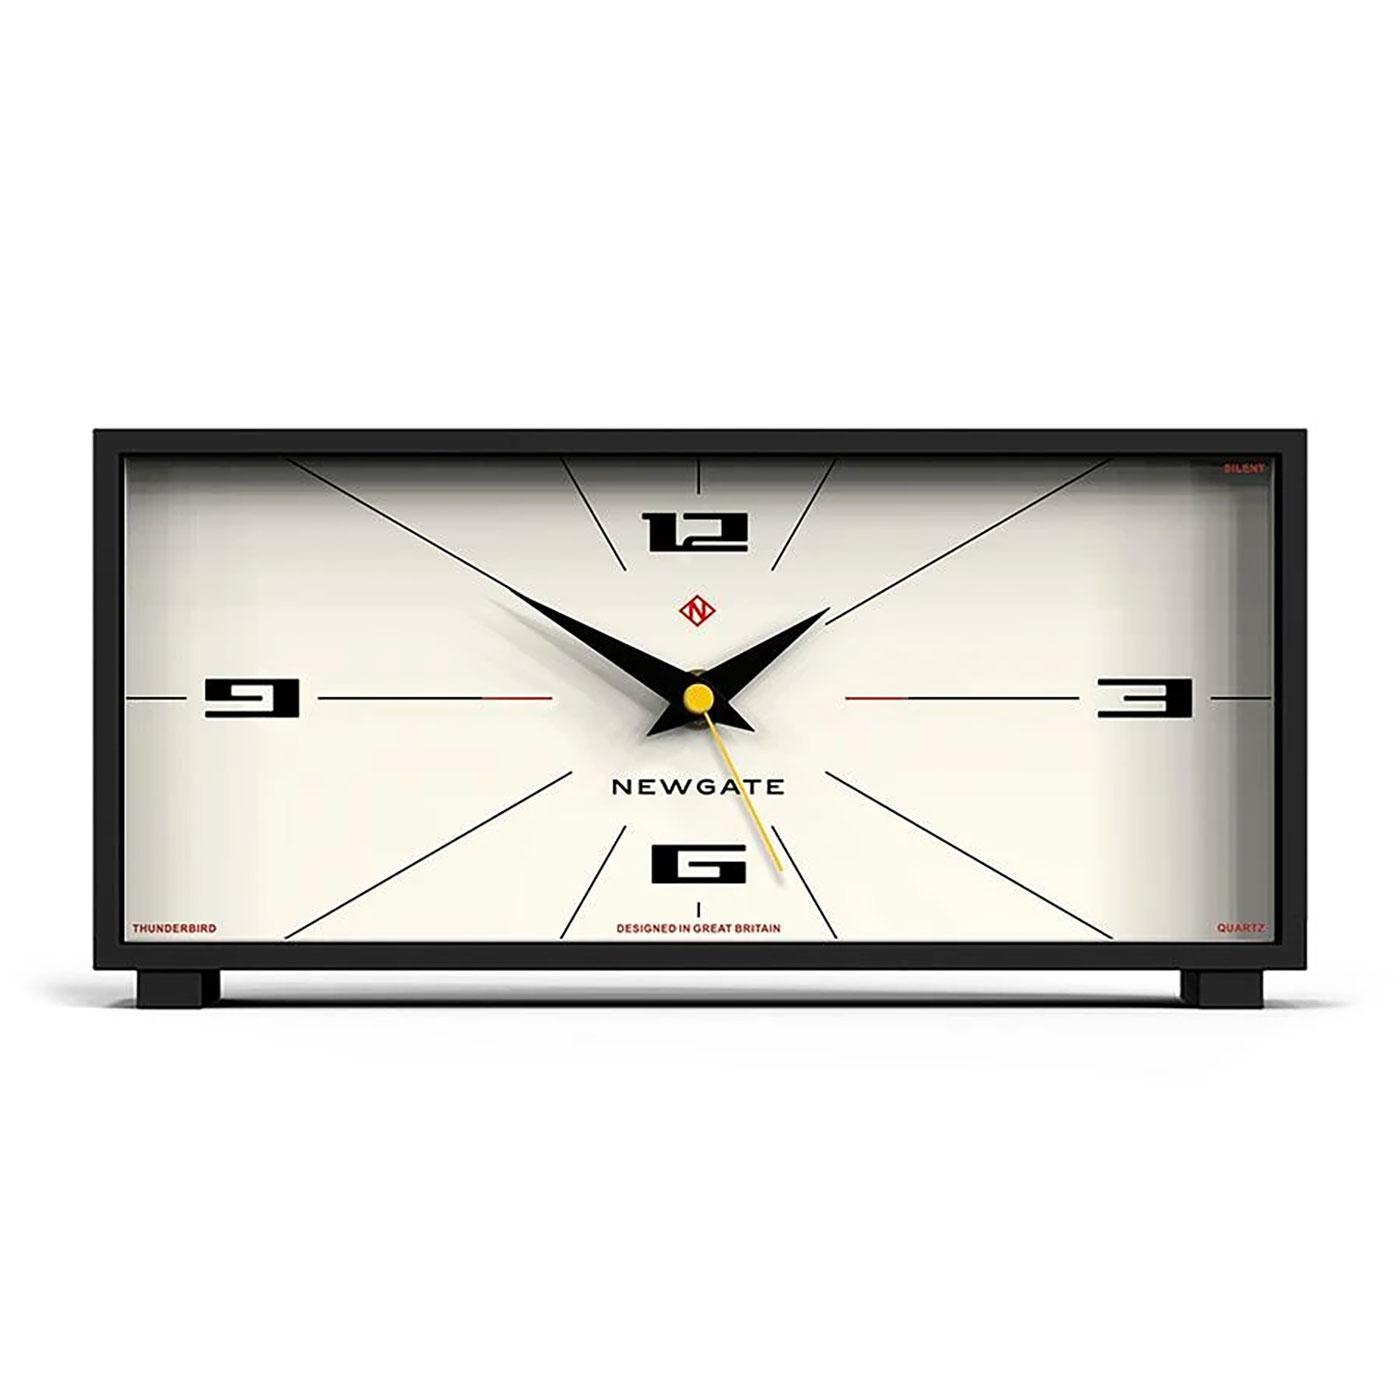 Thunderbird NEWGATE CLOCKS Retro Mantel Clock